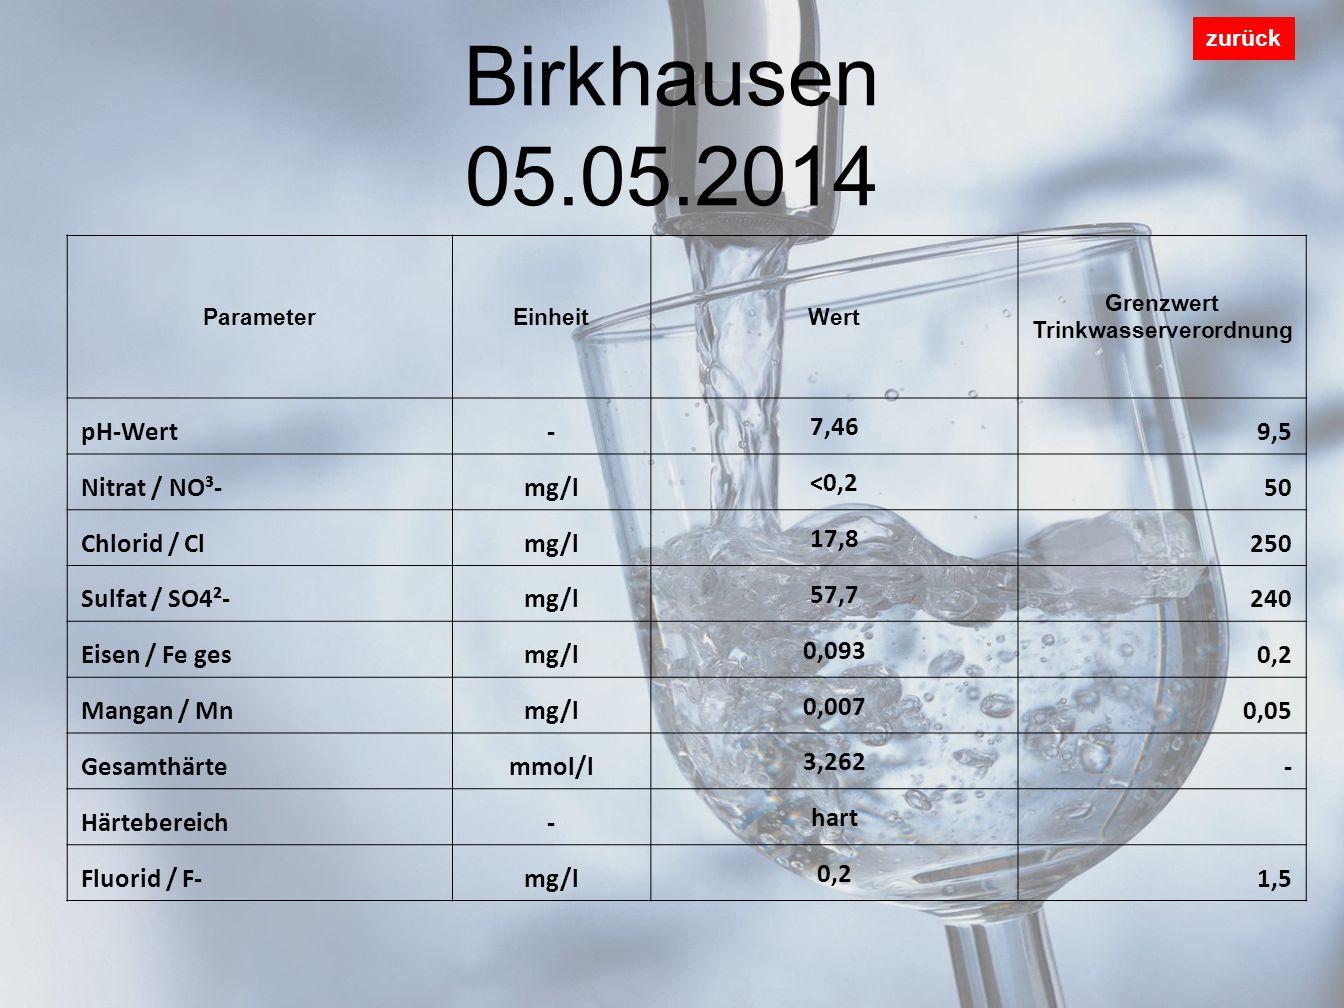 Birkhausen 05.05.2014 zurück ParameterEinheitWert Grenzwert Trinkwasserverordnung pH-Wert- 7,46 9,5 Nitrat / NO³-mg/l <0,2 50 Chlorid / Clmg/l 17,8 250 Sulfat / SO4²-mg/l 57,7 240 Eisen / Fe gesmg/l 0,093 0,2 Mangan / Mnmg/l 0,007 0,05 Gesamthärtemmol/l 3,262 - Härtebereich- hart Fluorid / F-mg/l 0,2 1,5